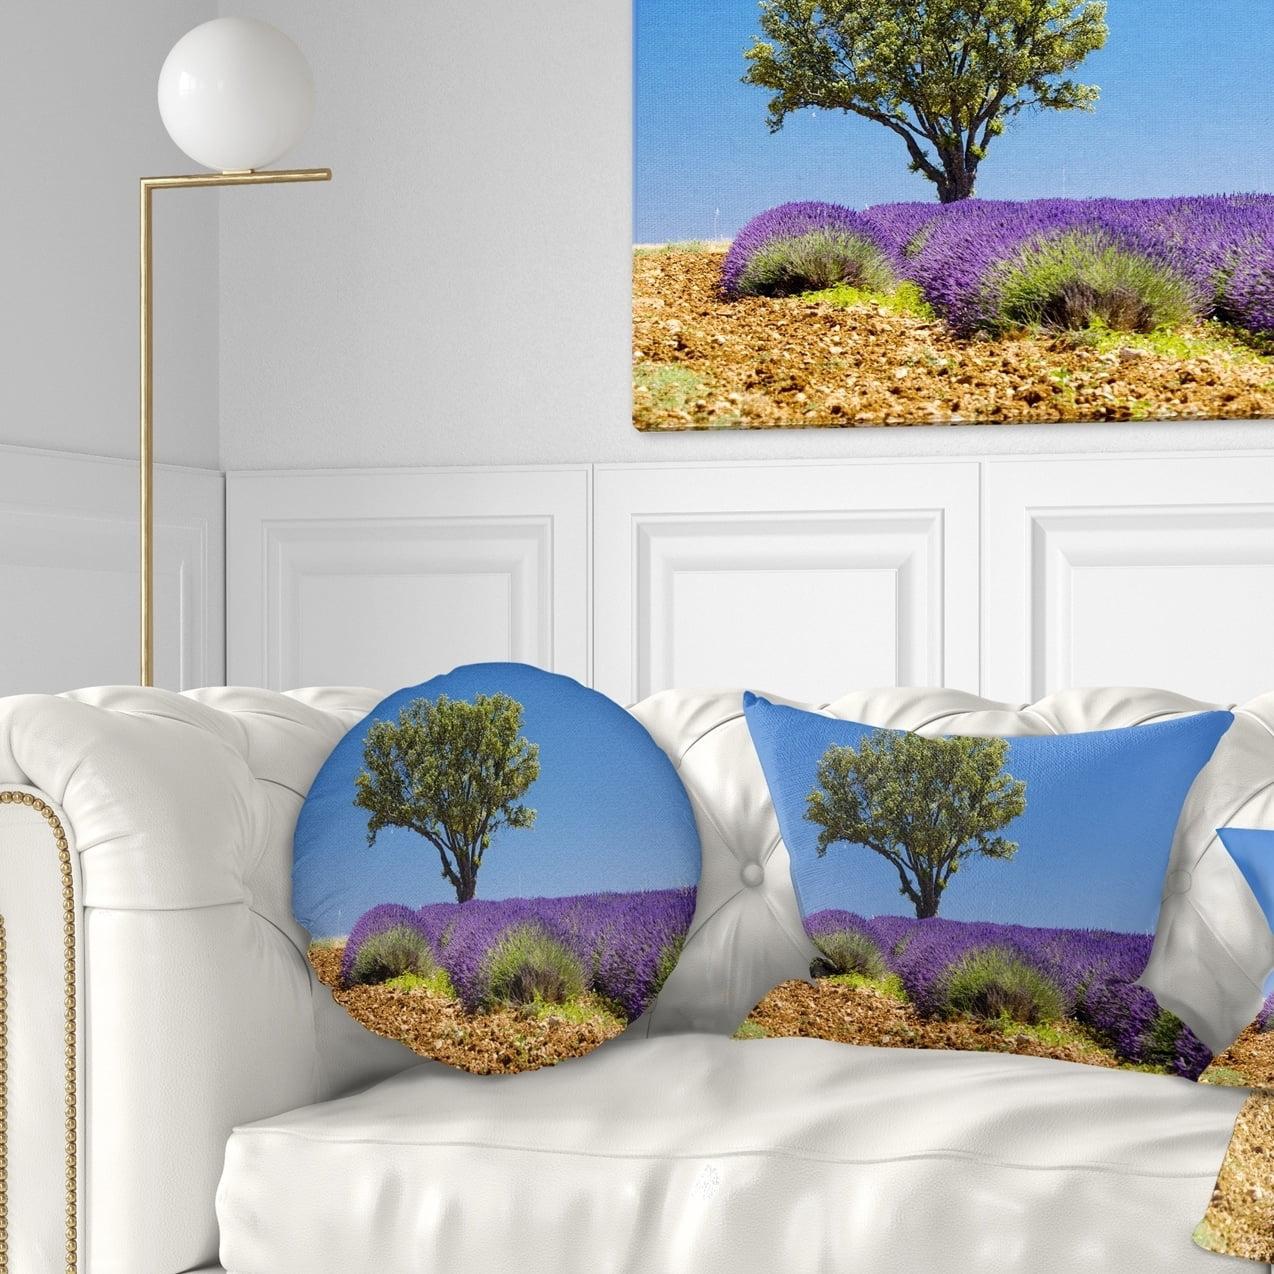 Design Art Designart Lone Green Tree In Lavender Field Landscape Printed Throw Pillow Walmart Com Walmart Com